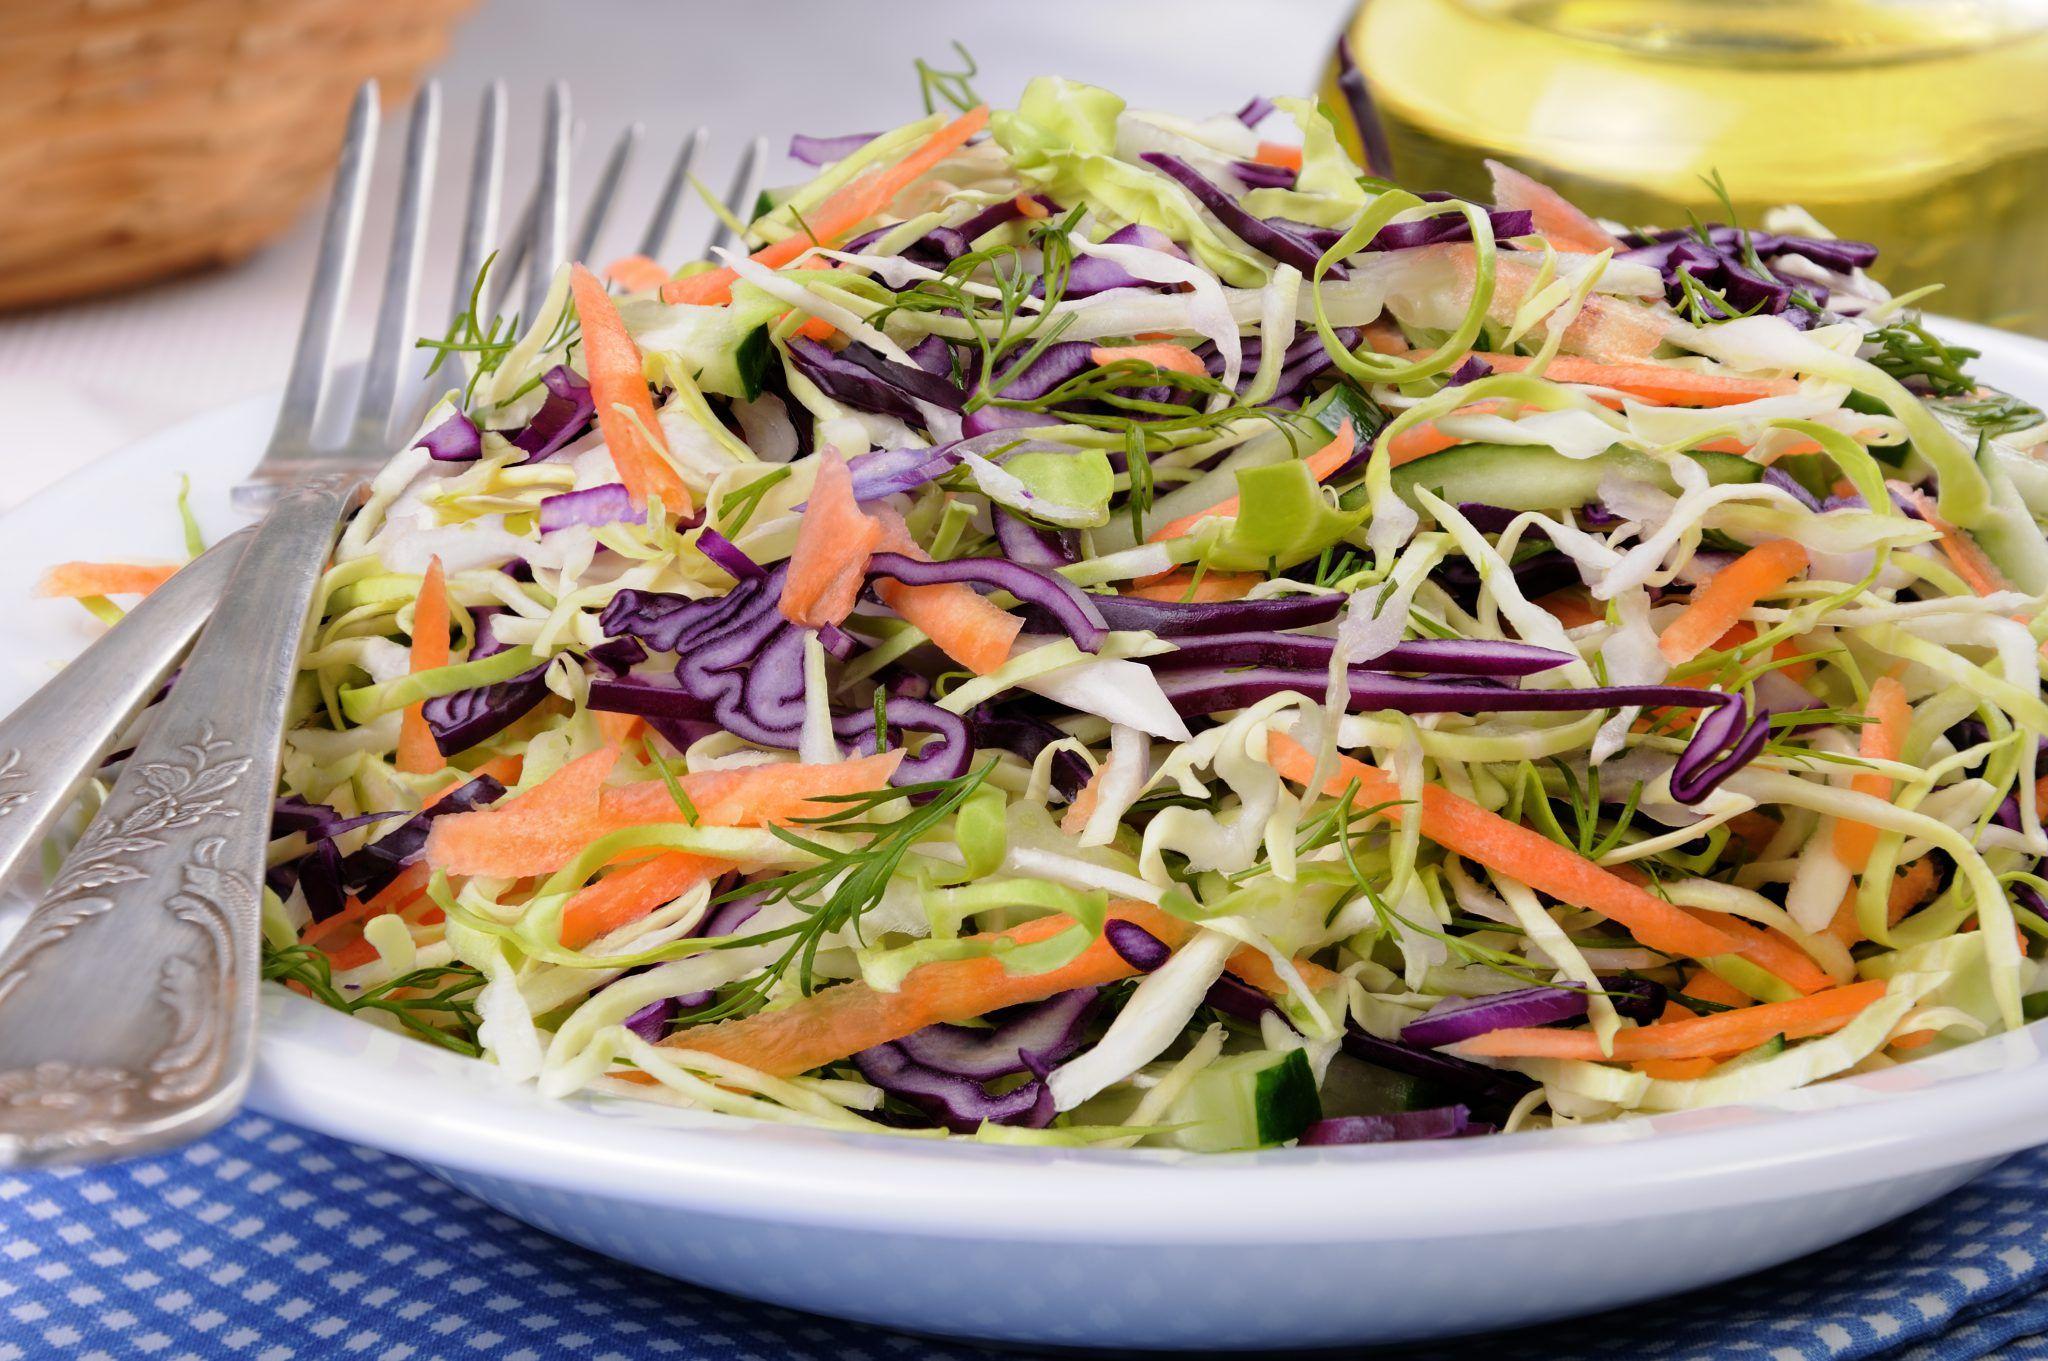 Easy coleslaw recipe easy coleslaw recipes coleslaw